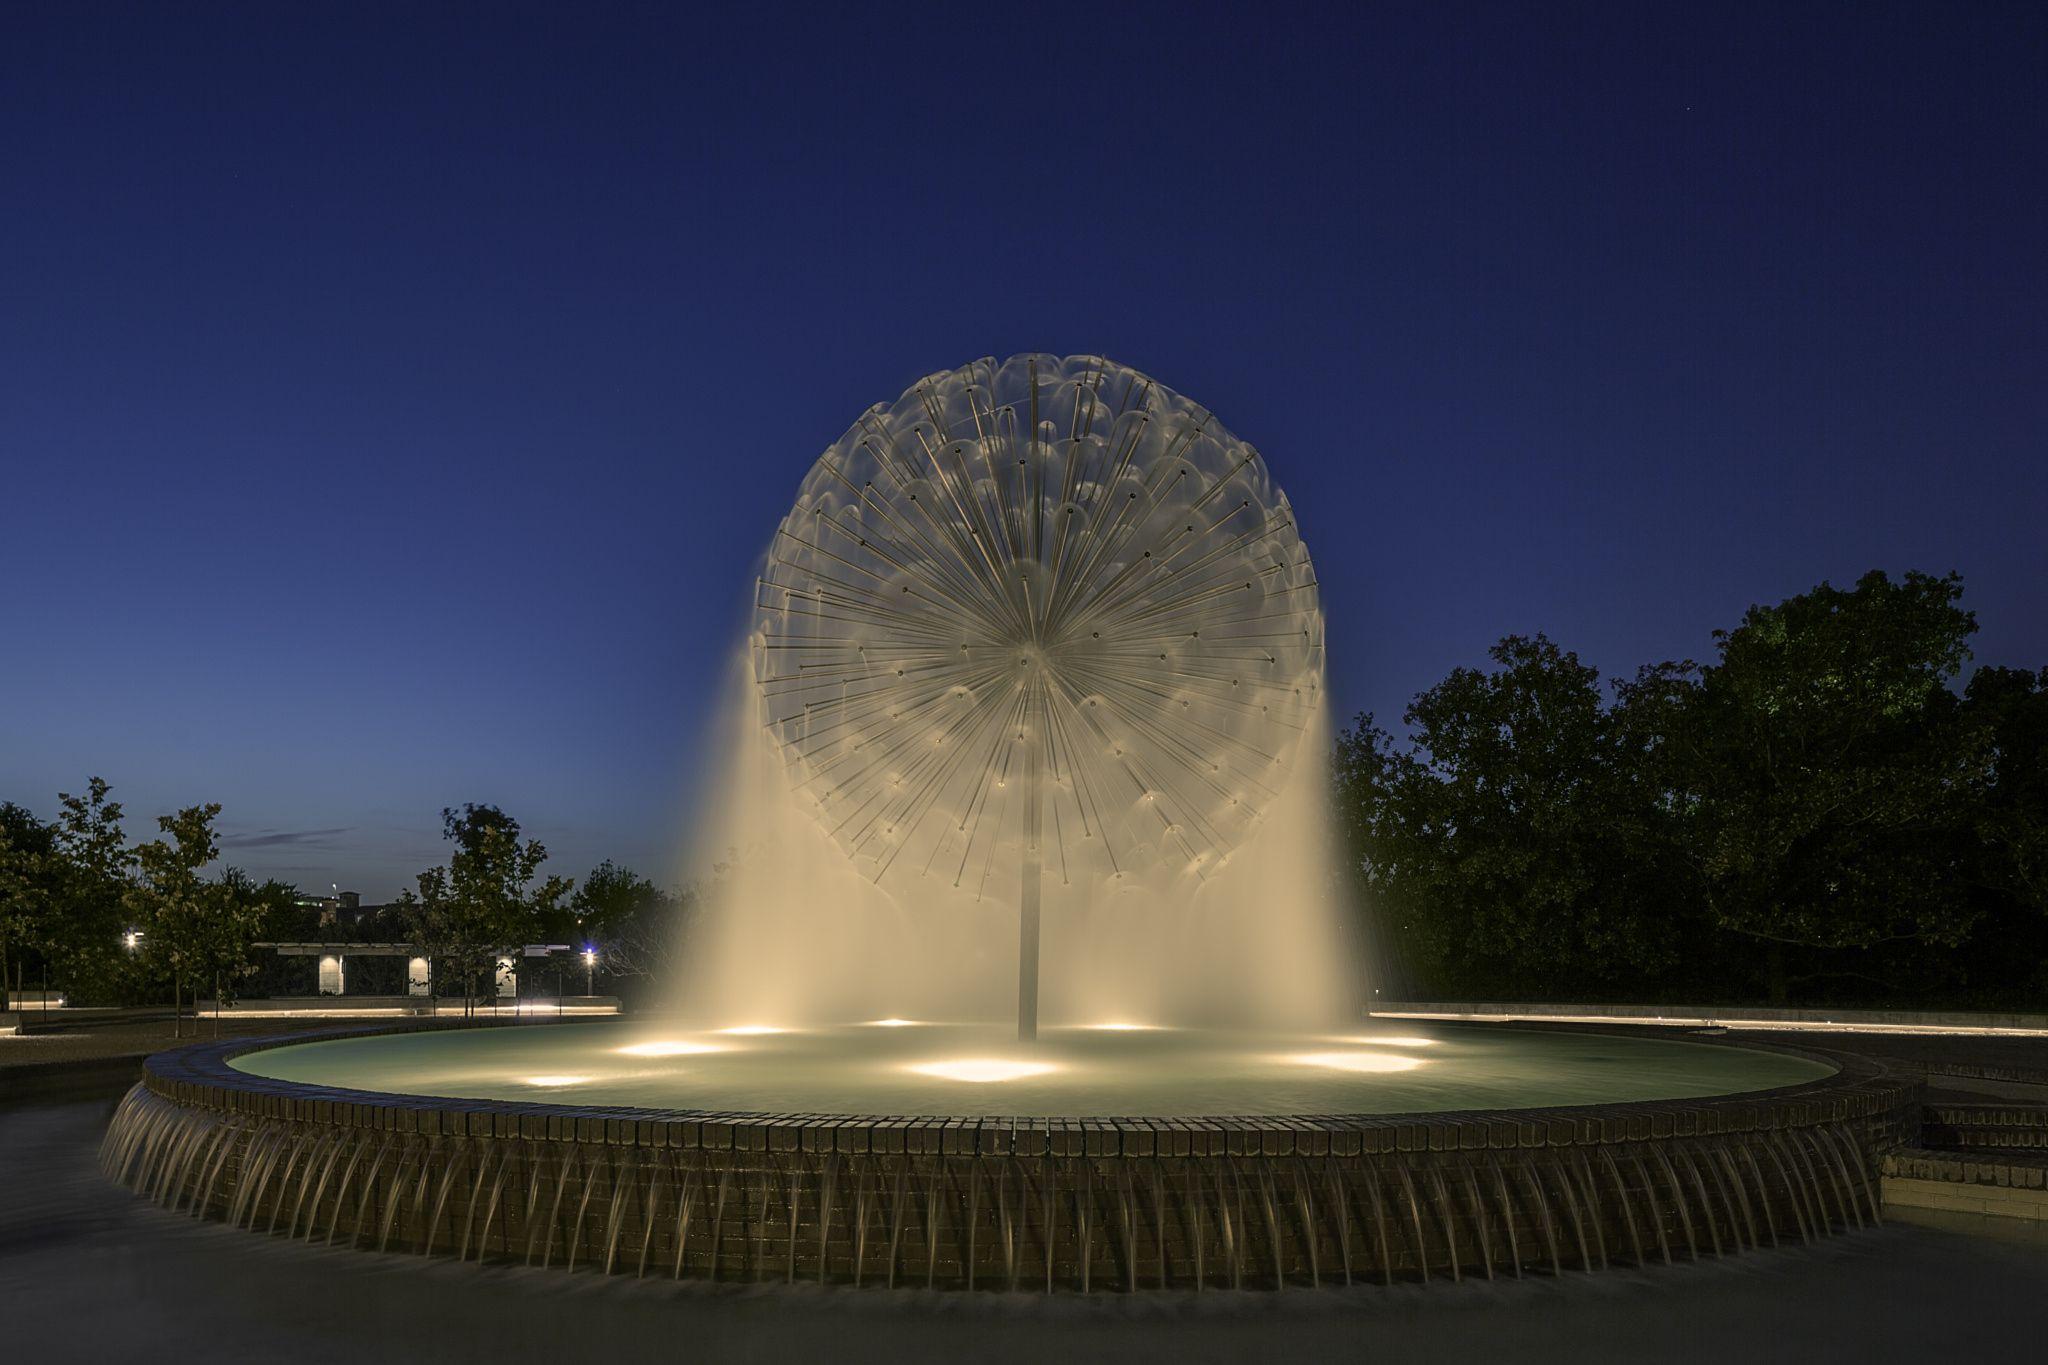 Gus S Wortham Memorial Fountain The Gus S. Wortham